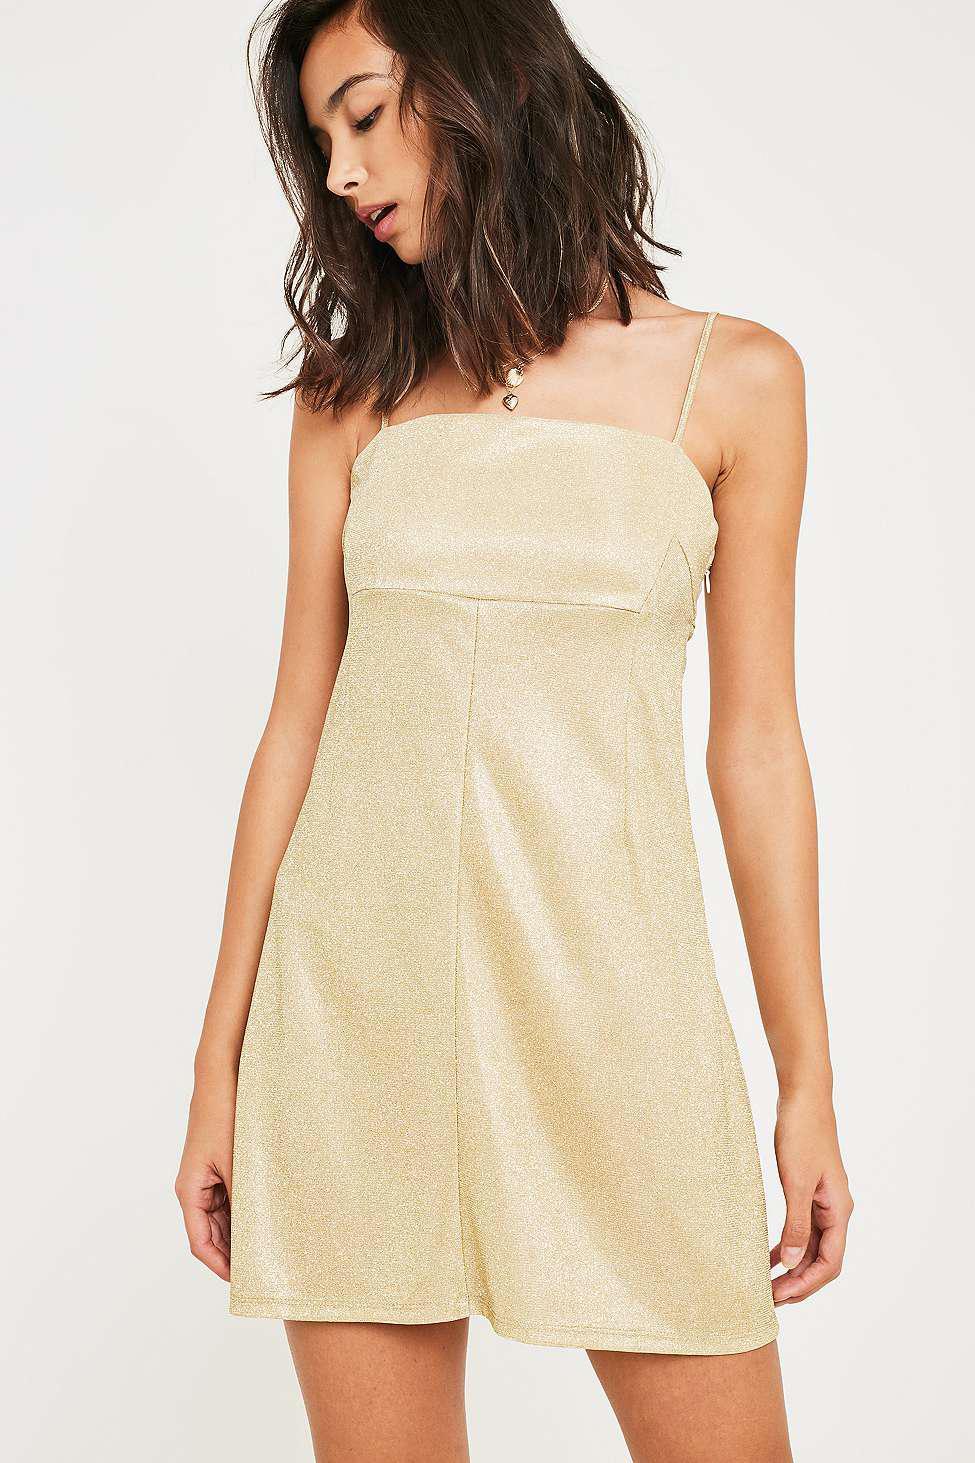 25f1c403c1d1e Urban Outfitters Uo Moonbeam Gold Metallic Slip Dress - Womens Xs in ...